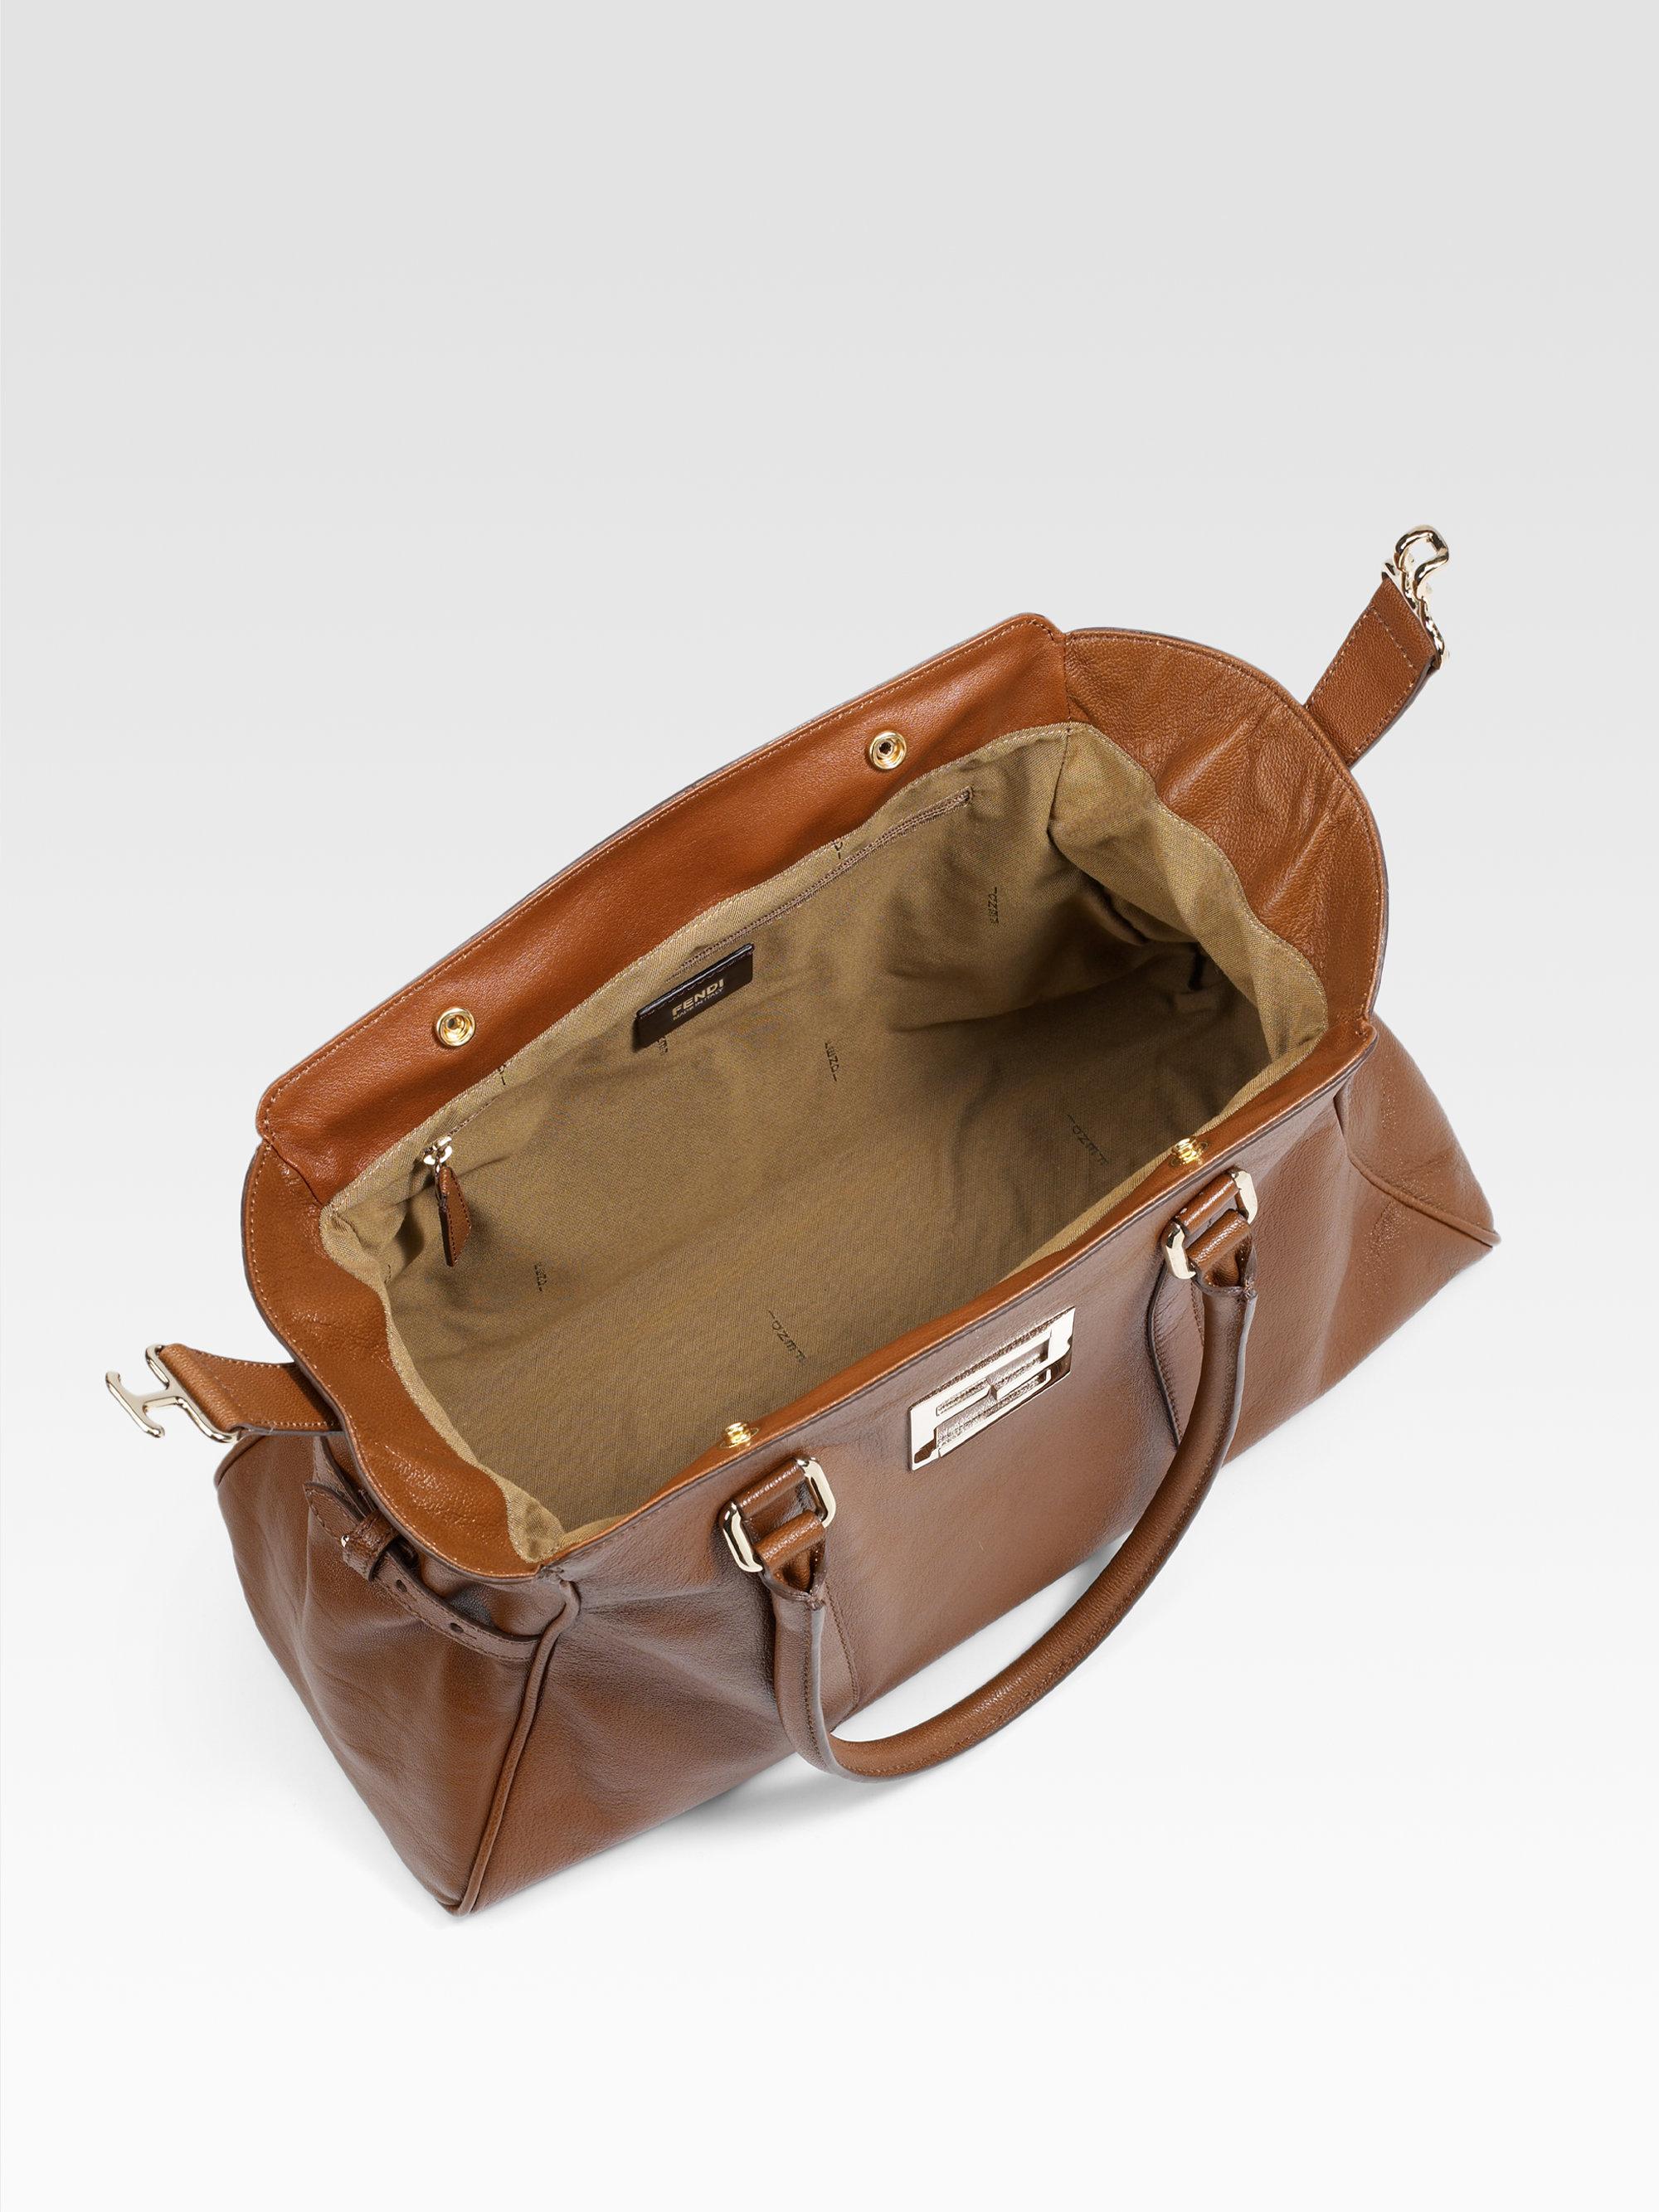 393308fe54 ... canada lyst fendi leather bag de jour tote in brown 543b8 258bd ...